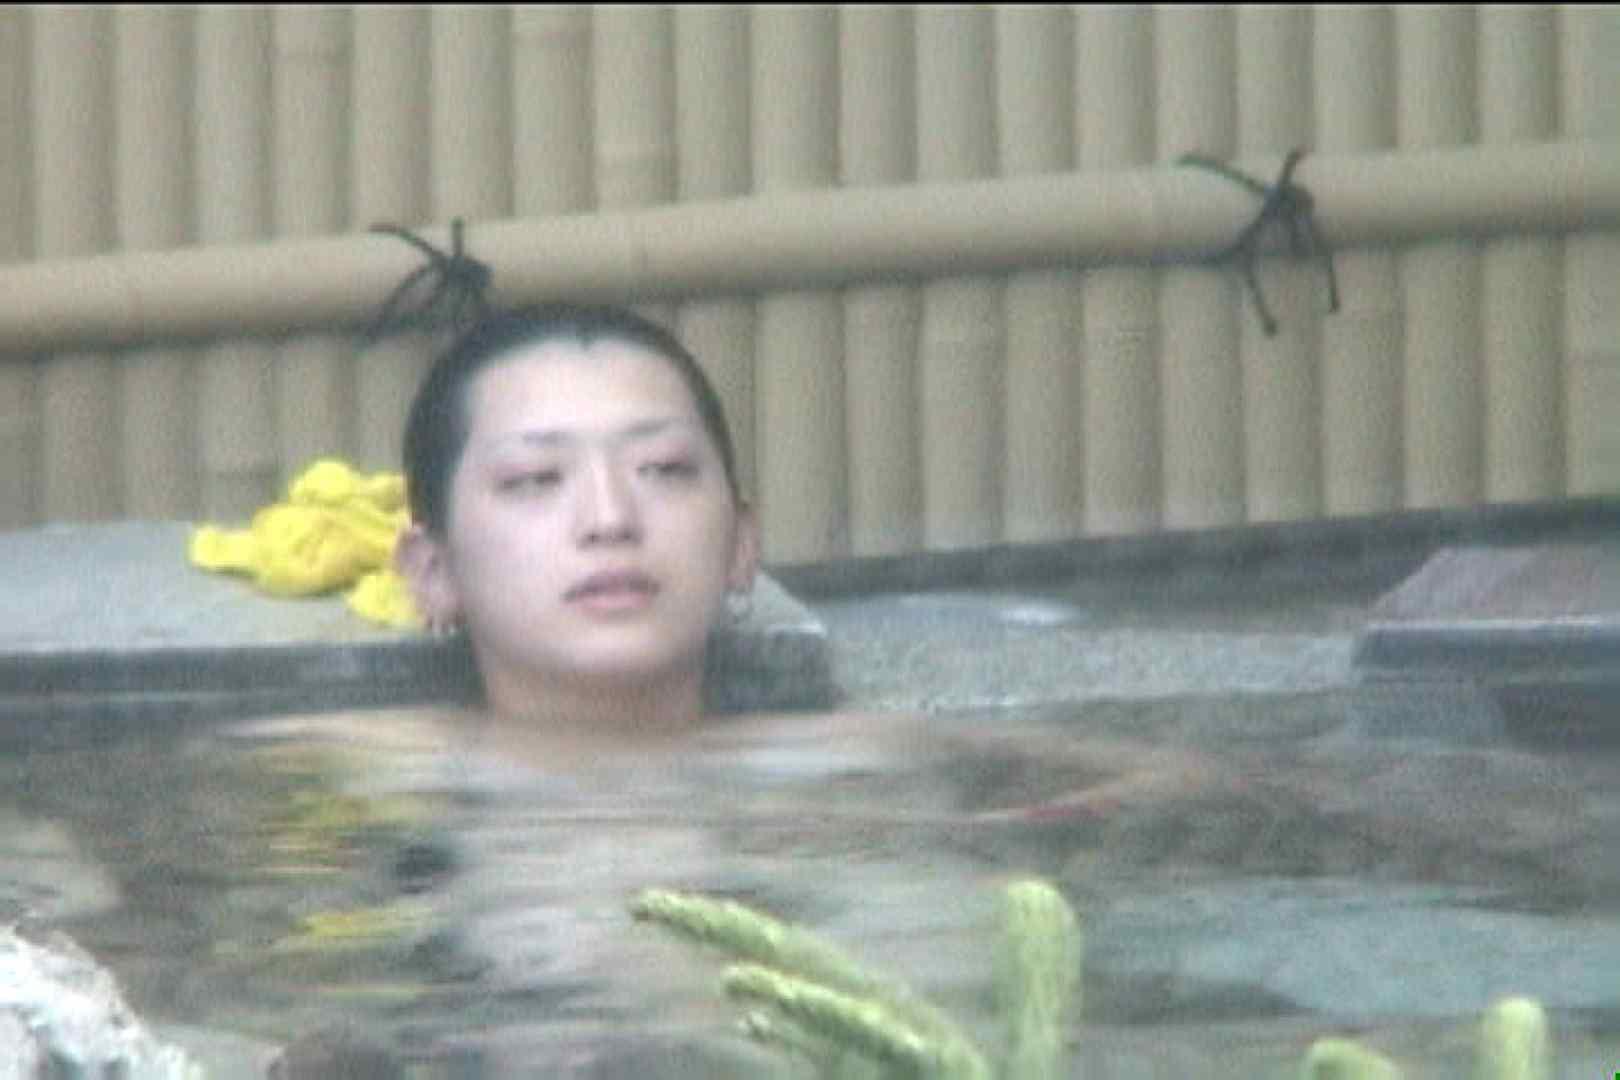 Aquaな露天風呂Vol.102 女体盗撮 | OL女体  54連発 25